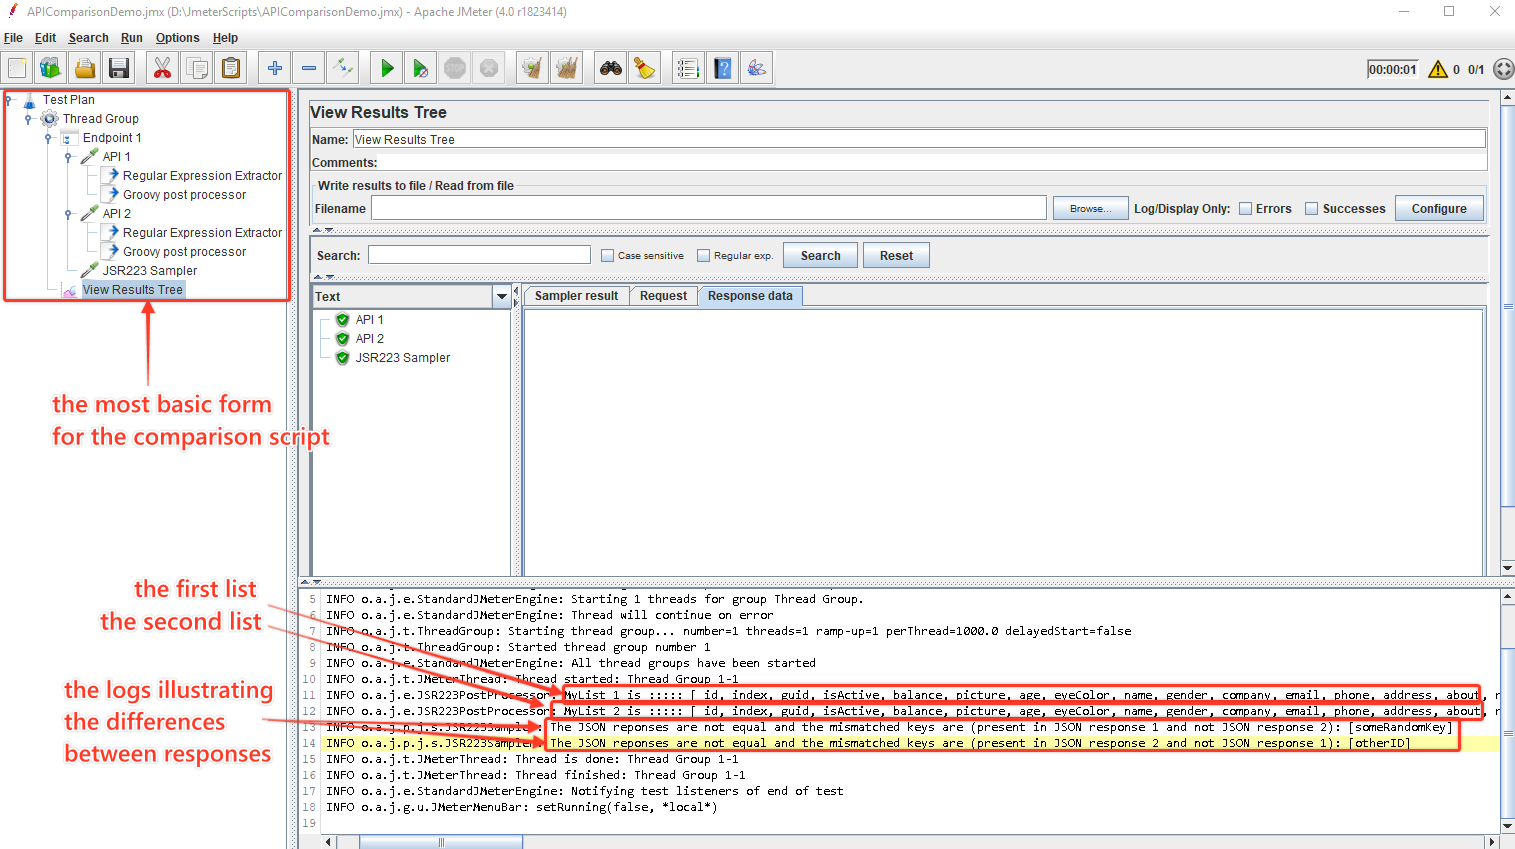 JMeter Script Tree & Logs